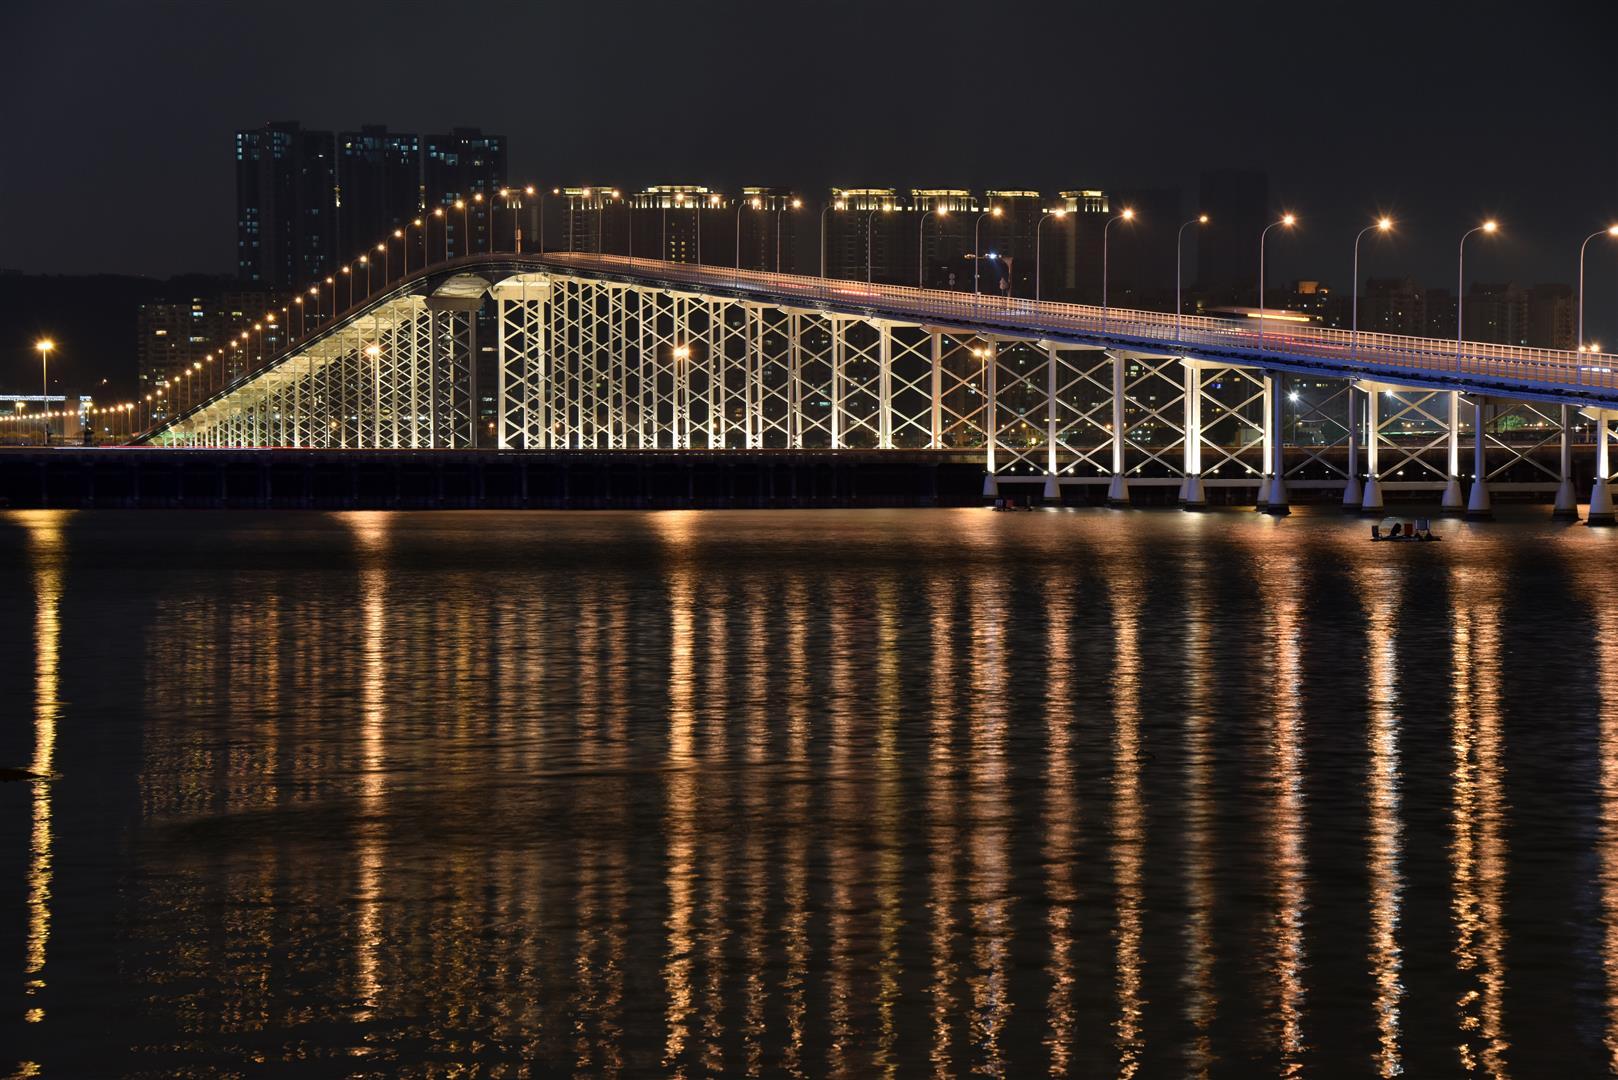 Macau Bridge Night (Large)